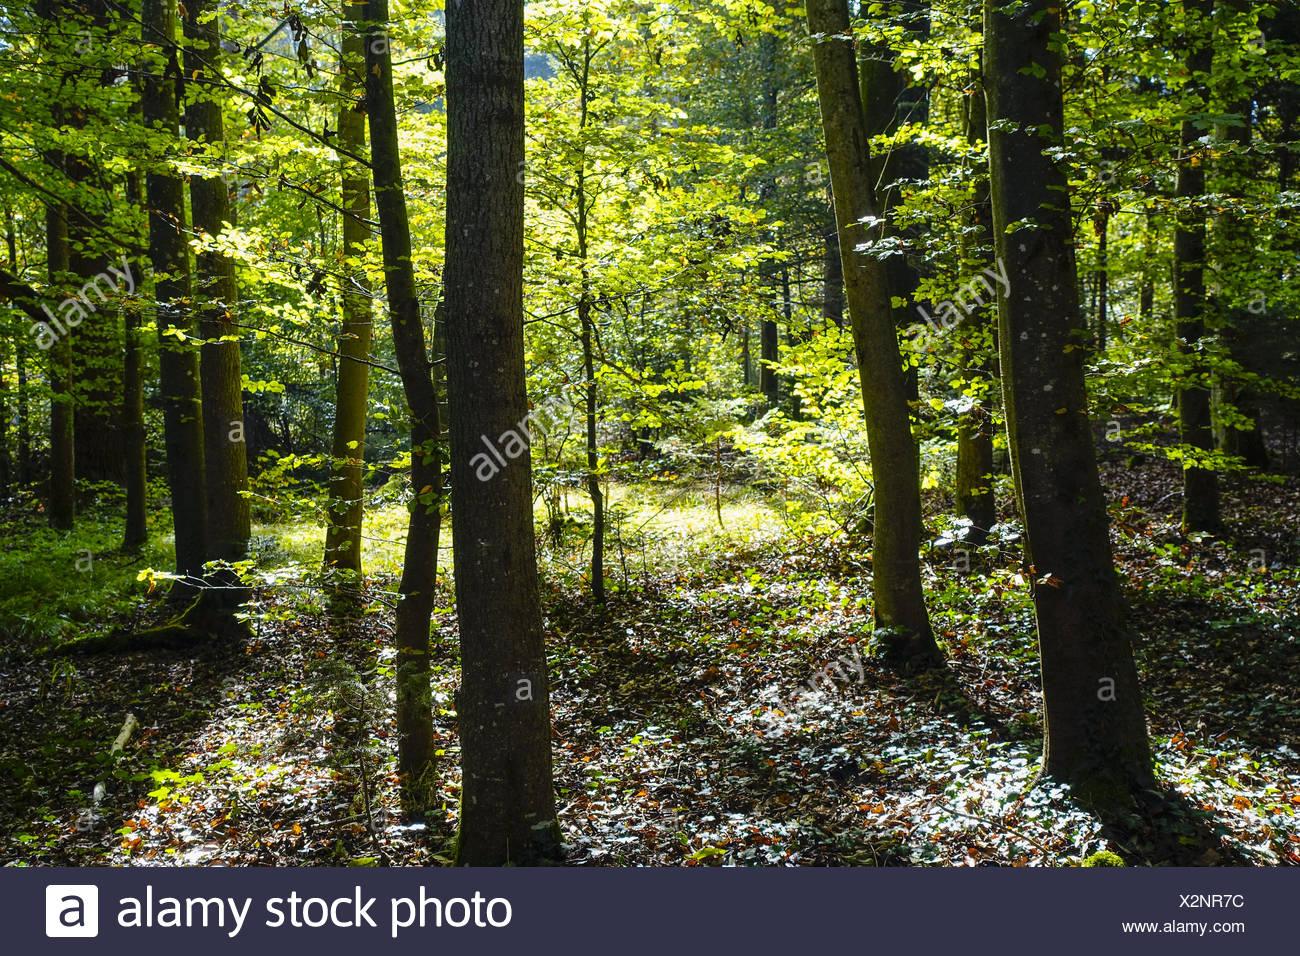 Sonnenstrahlen durchfluteten einen Wald, Sunbeams flooded the forest, background, Bavaria, Bavarian, beam, beams, beauty, botani - Stock Image